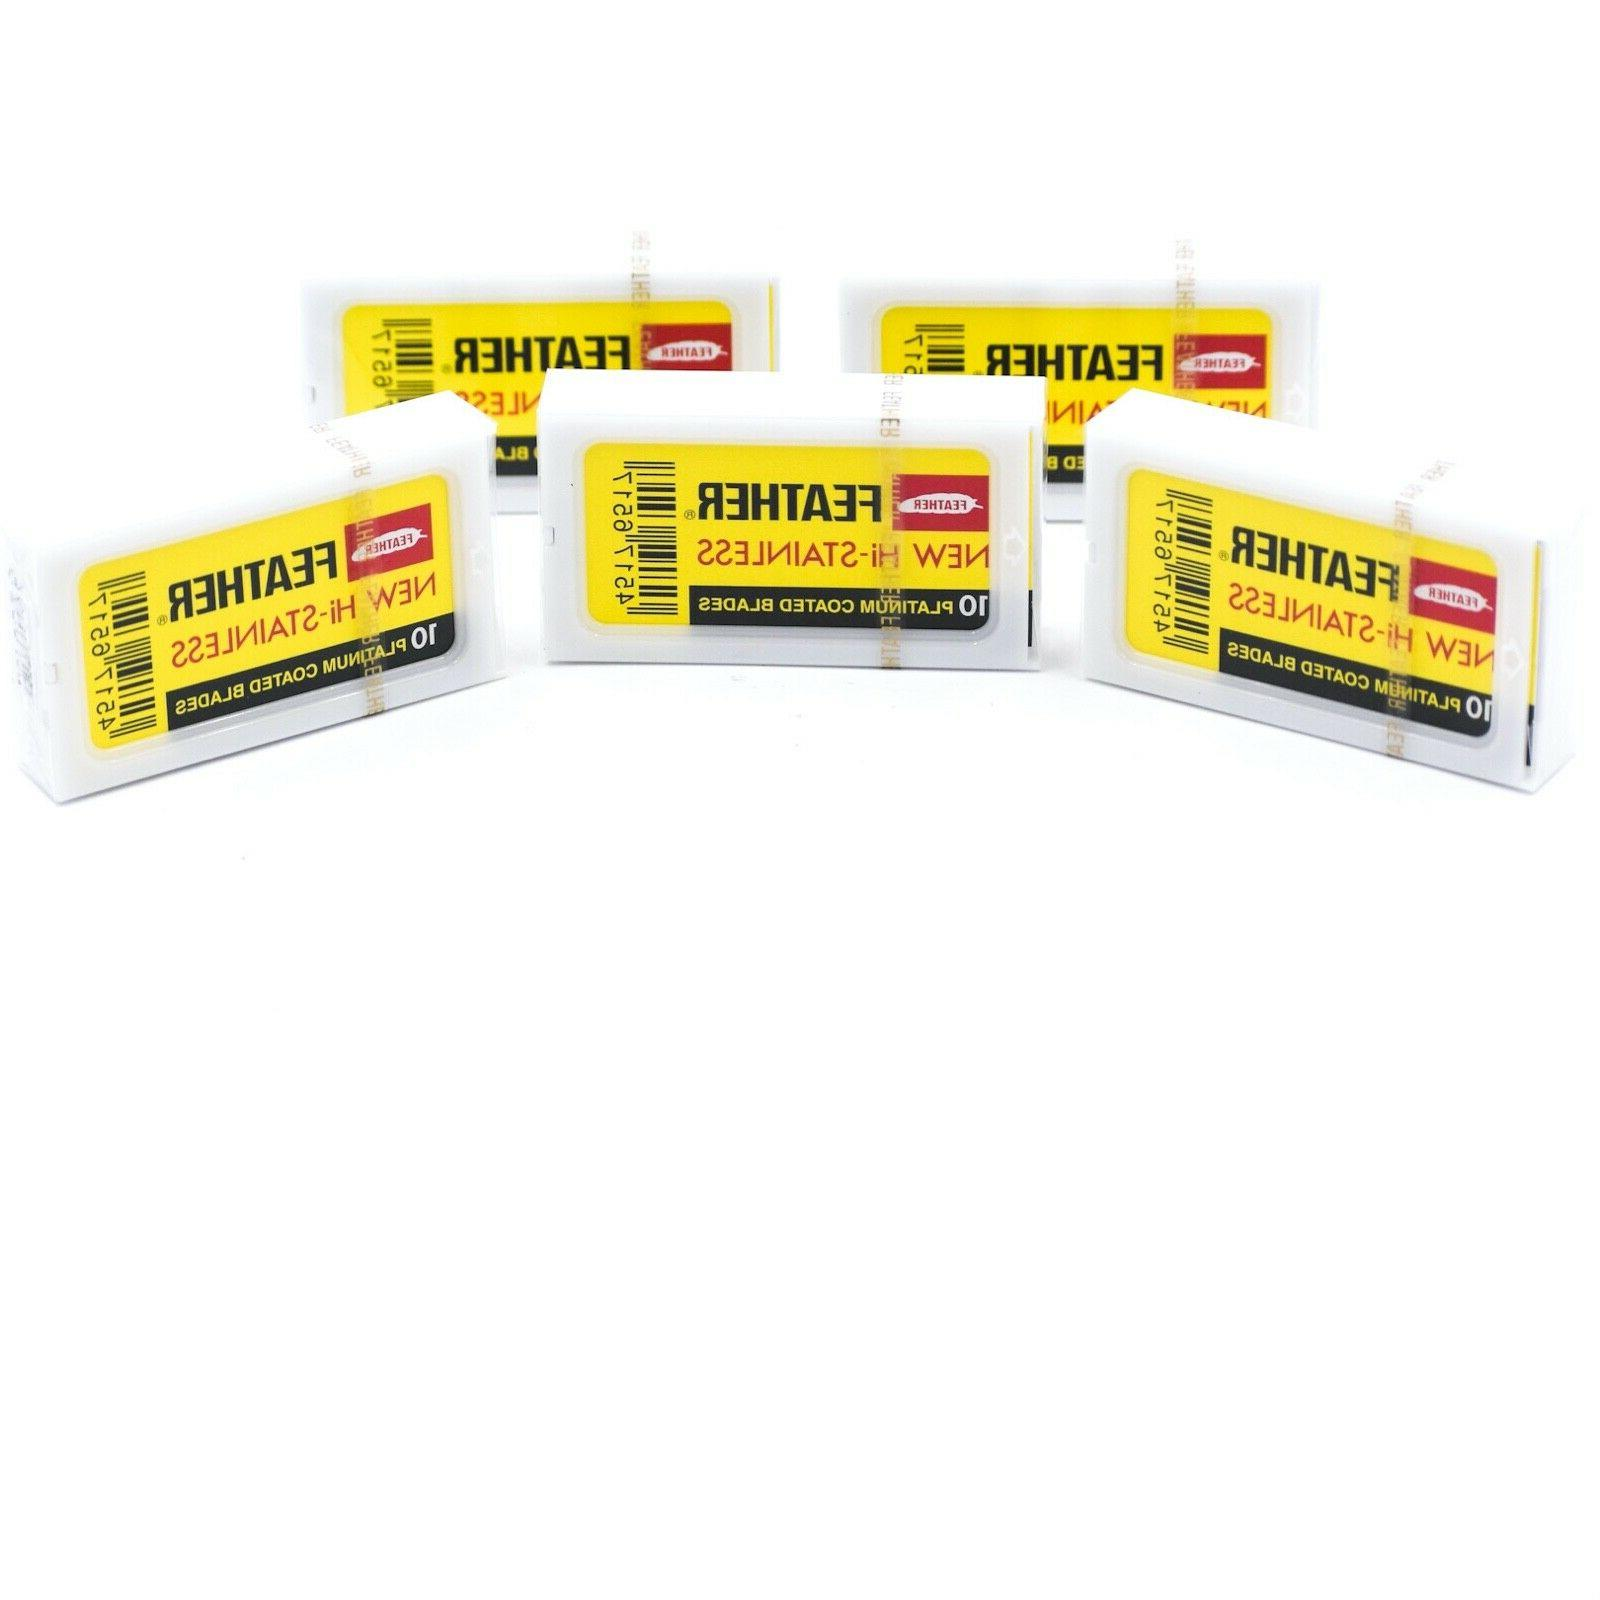 50 FEATHER Hi-Stainless Platinum Double Edge Safety Razor Bl